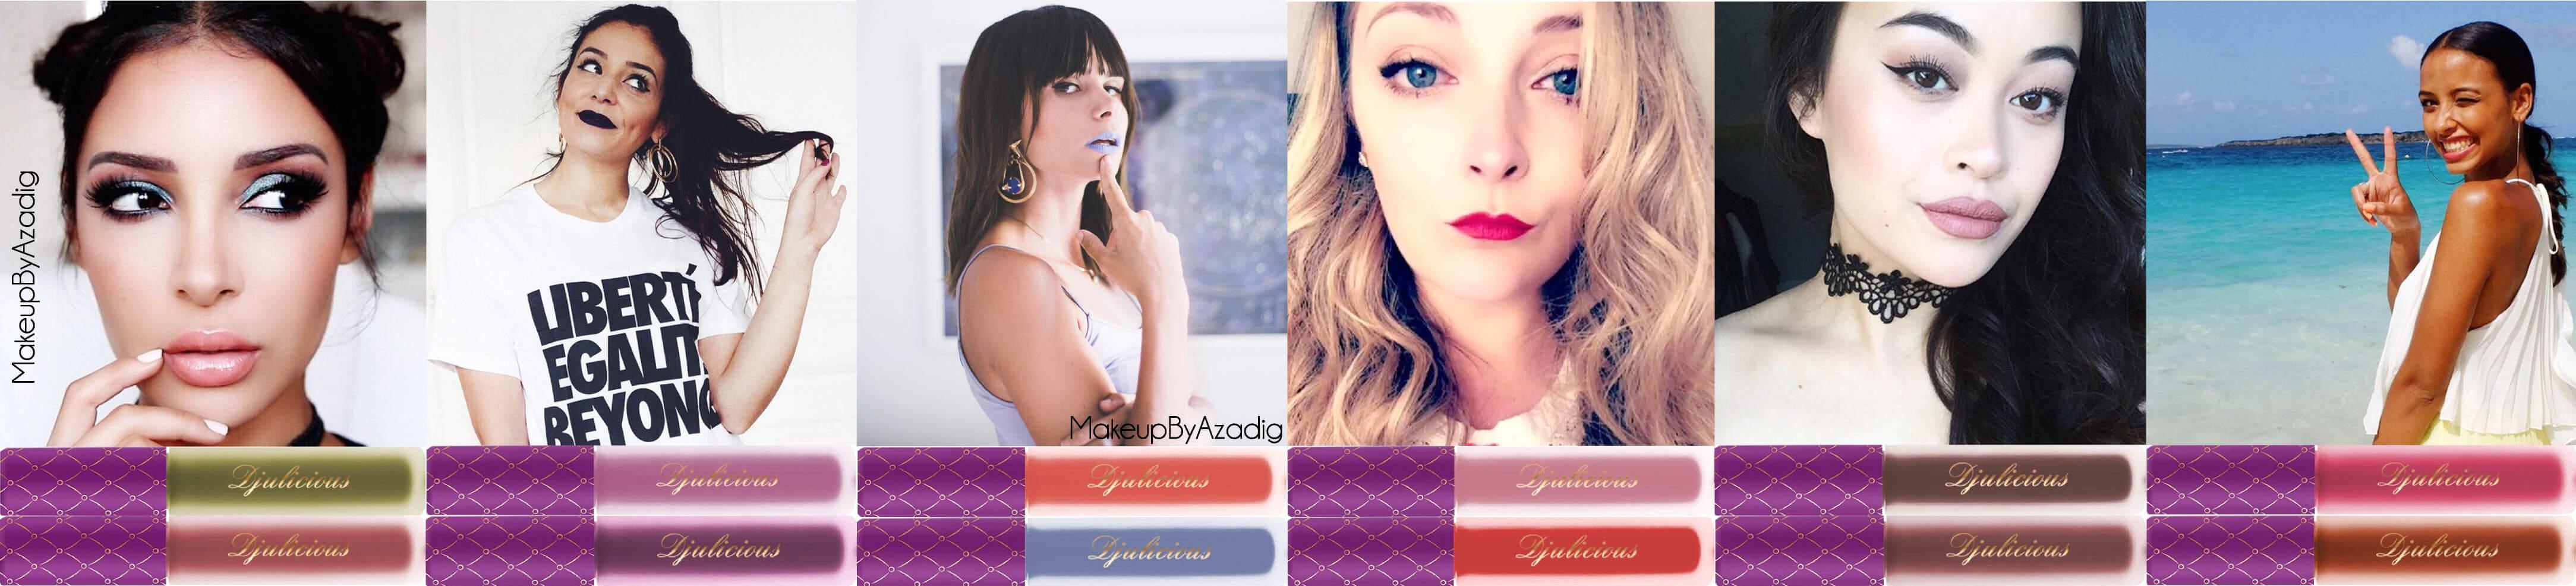 makeupbyazadig-djulicious-cosmetics-sananas-peekabooo-knoetzie-natacha-birds-julie-world-of-beauty-booolicious-sanoulicious-paris-troyes-dijon-dulcematte-revue-girlsfever-influenceurs